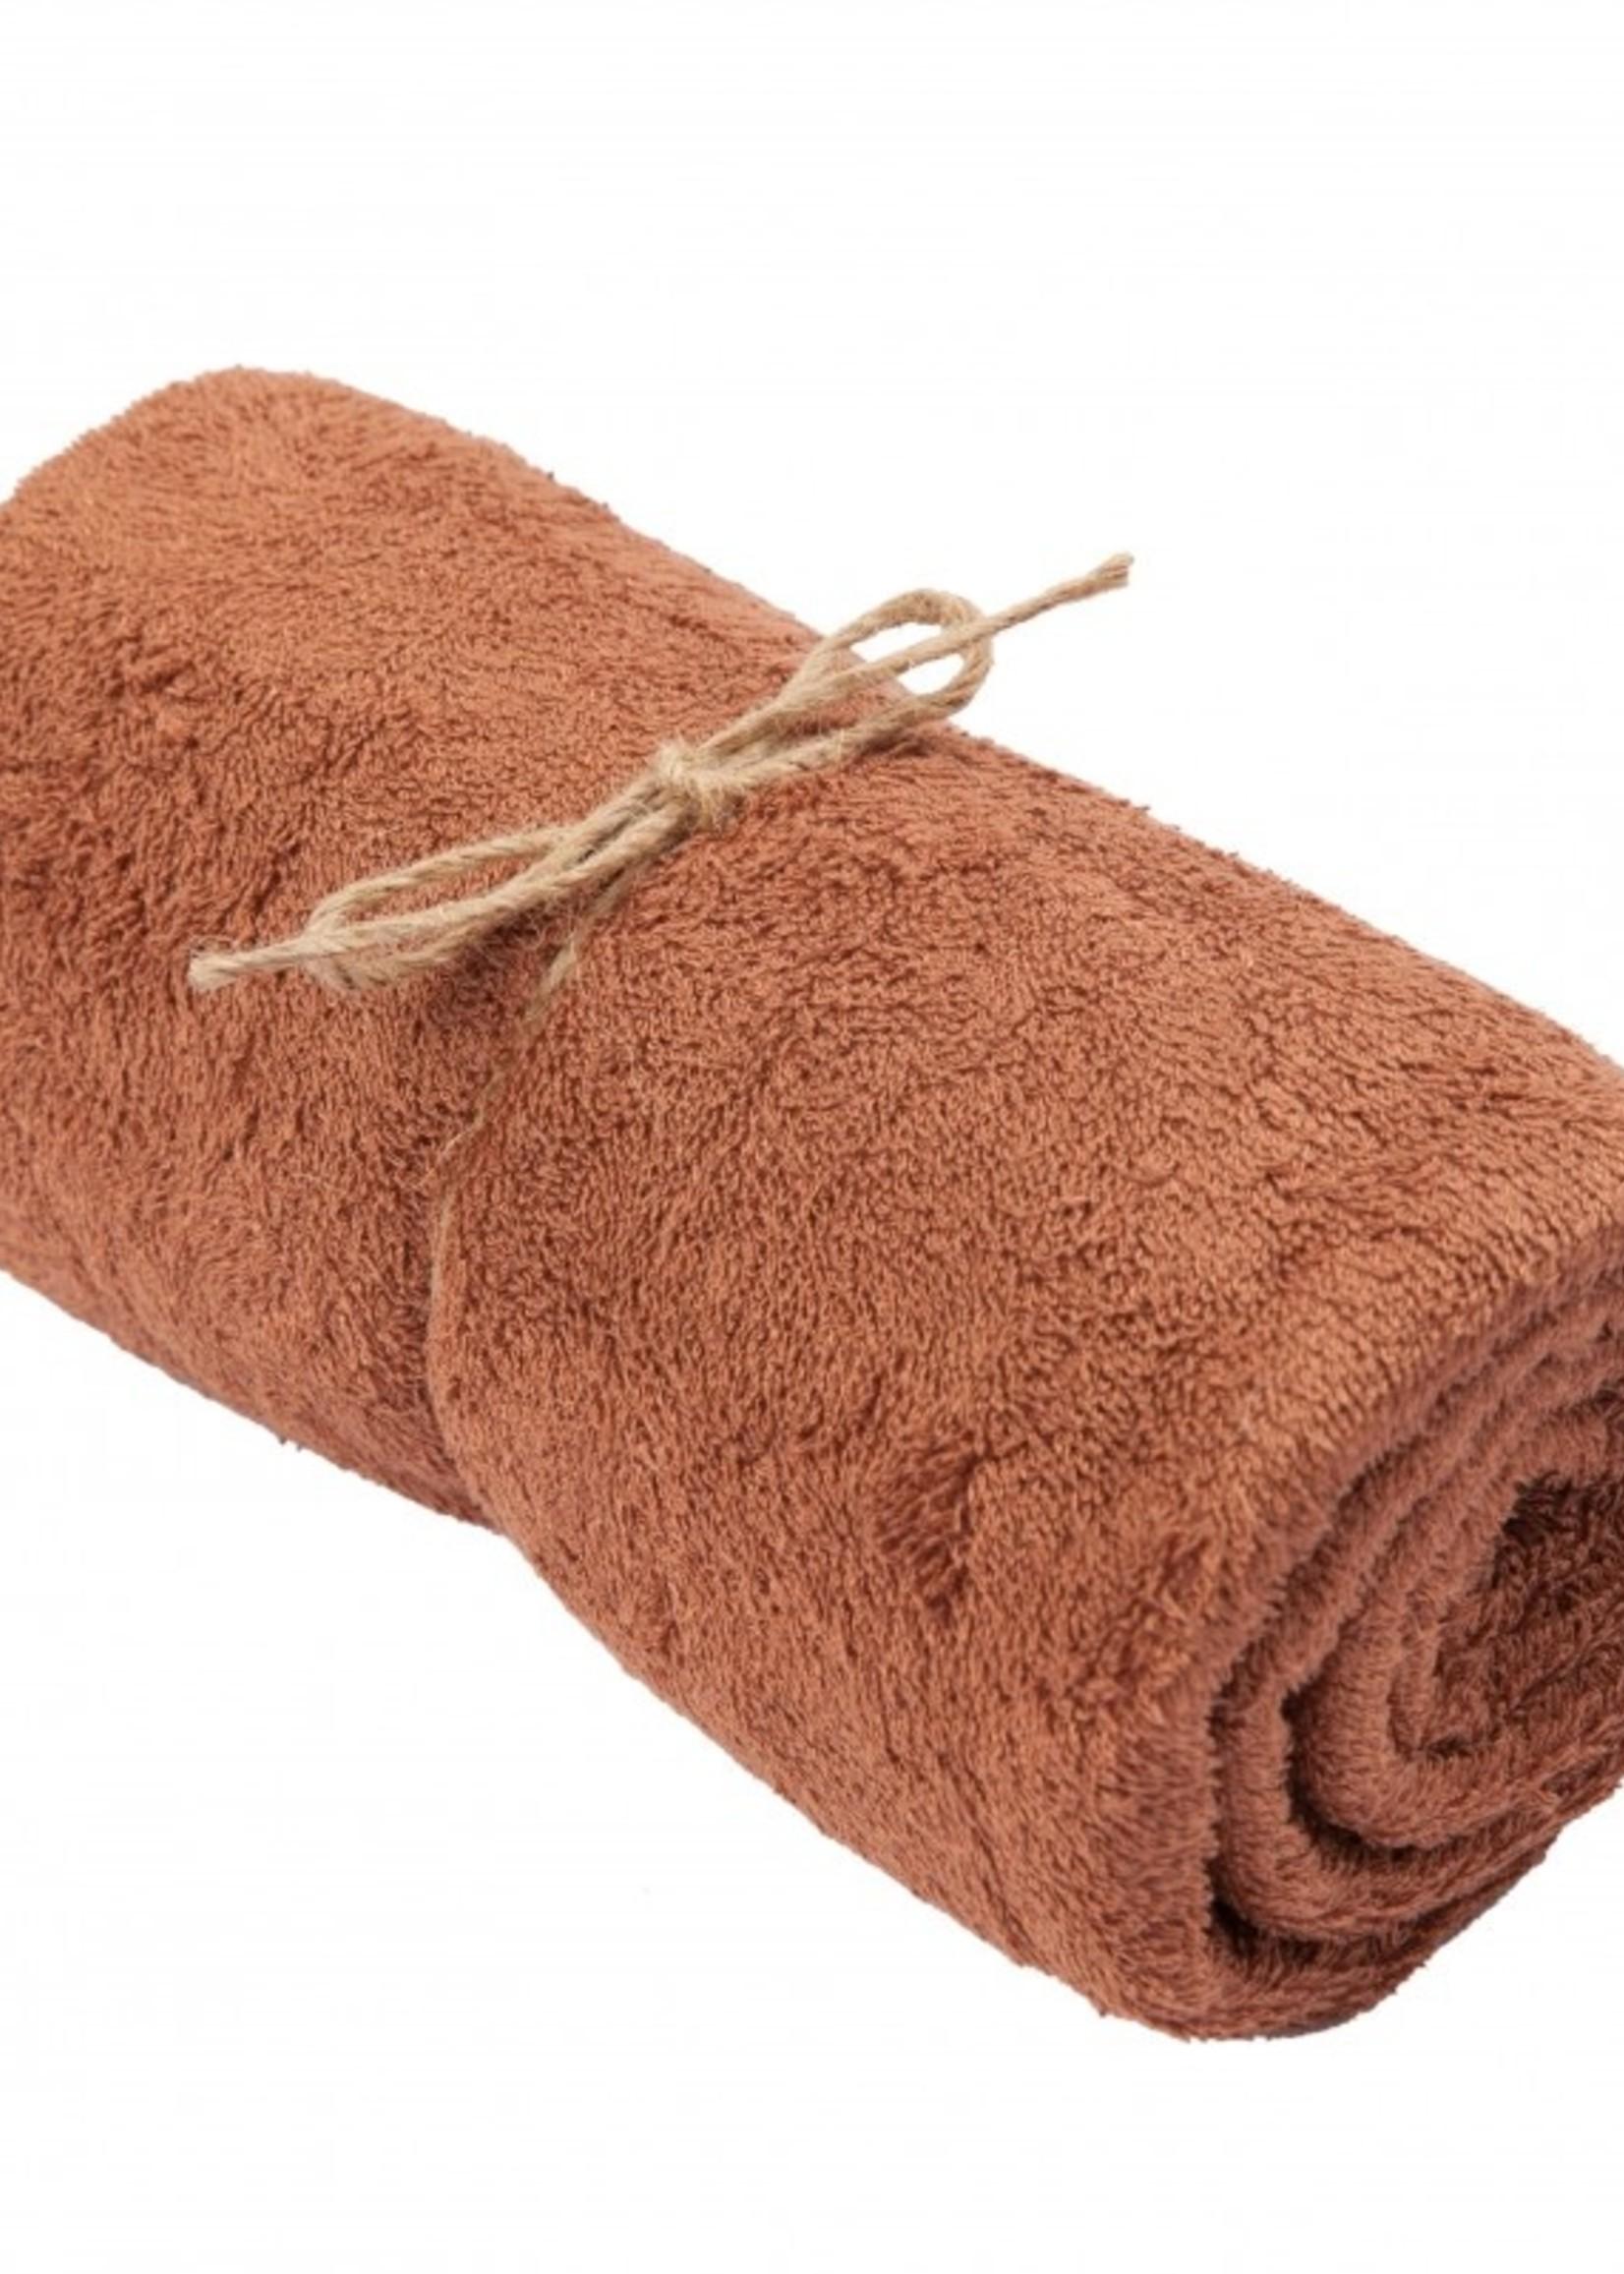 Timboo Towel Extra Large - Hazel Brown